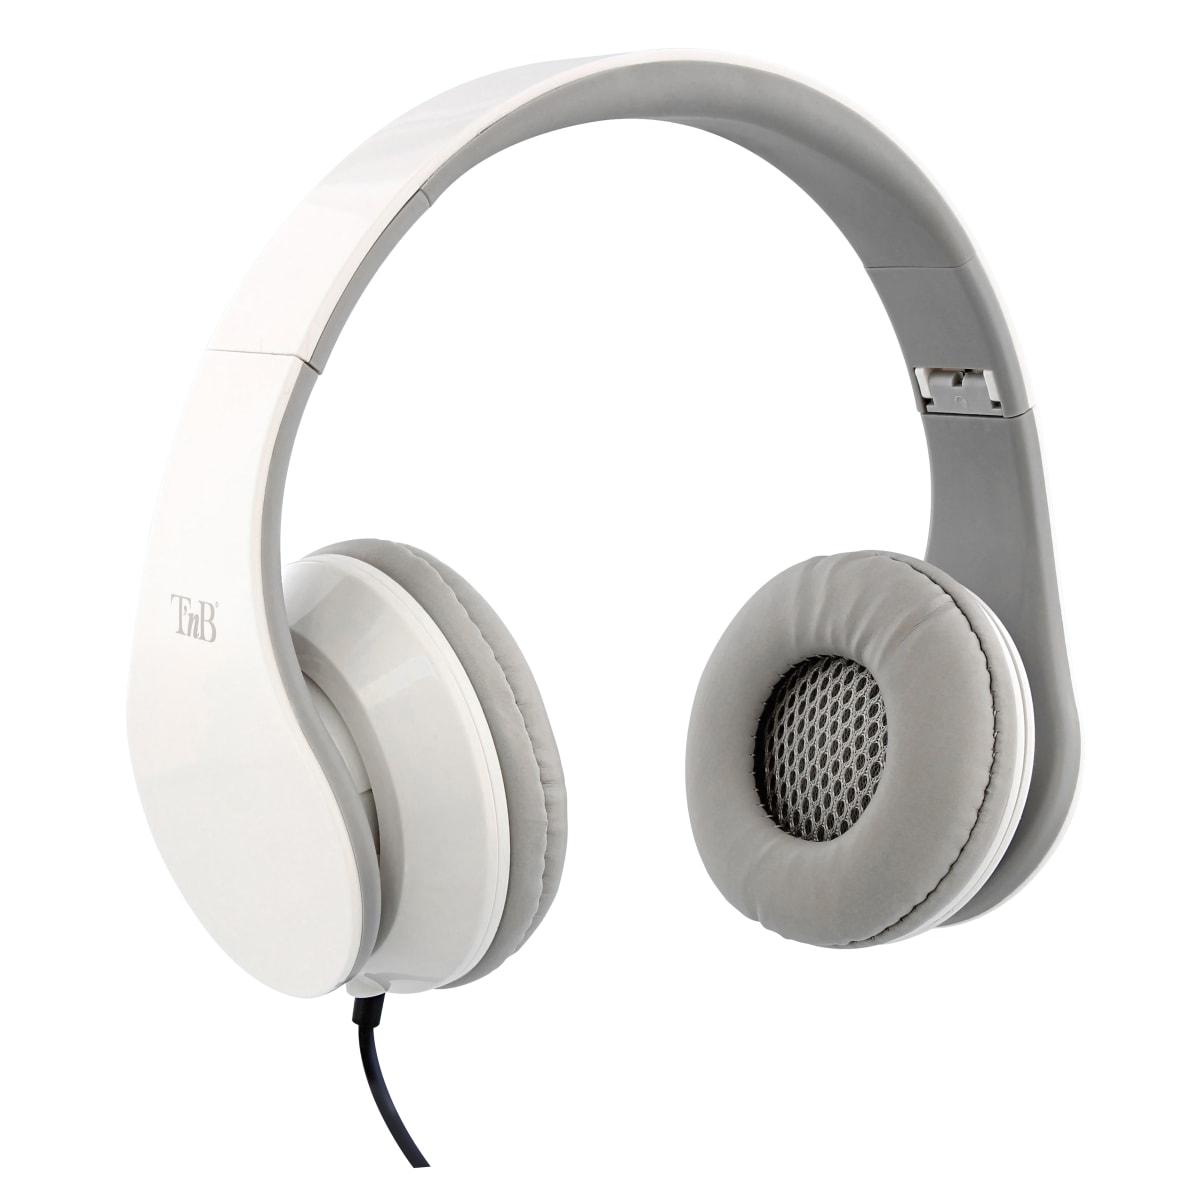 STREAM jack 3,5mm wired headphone white